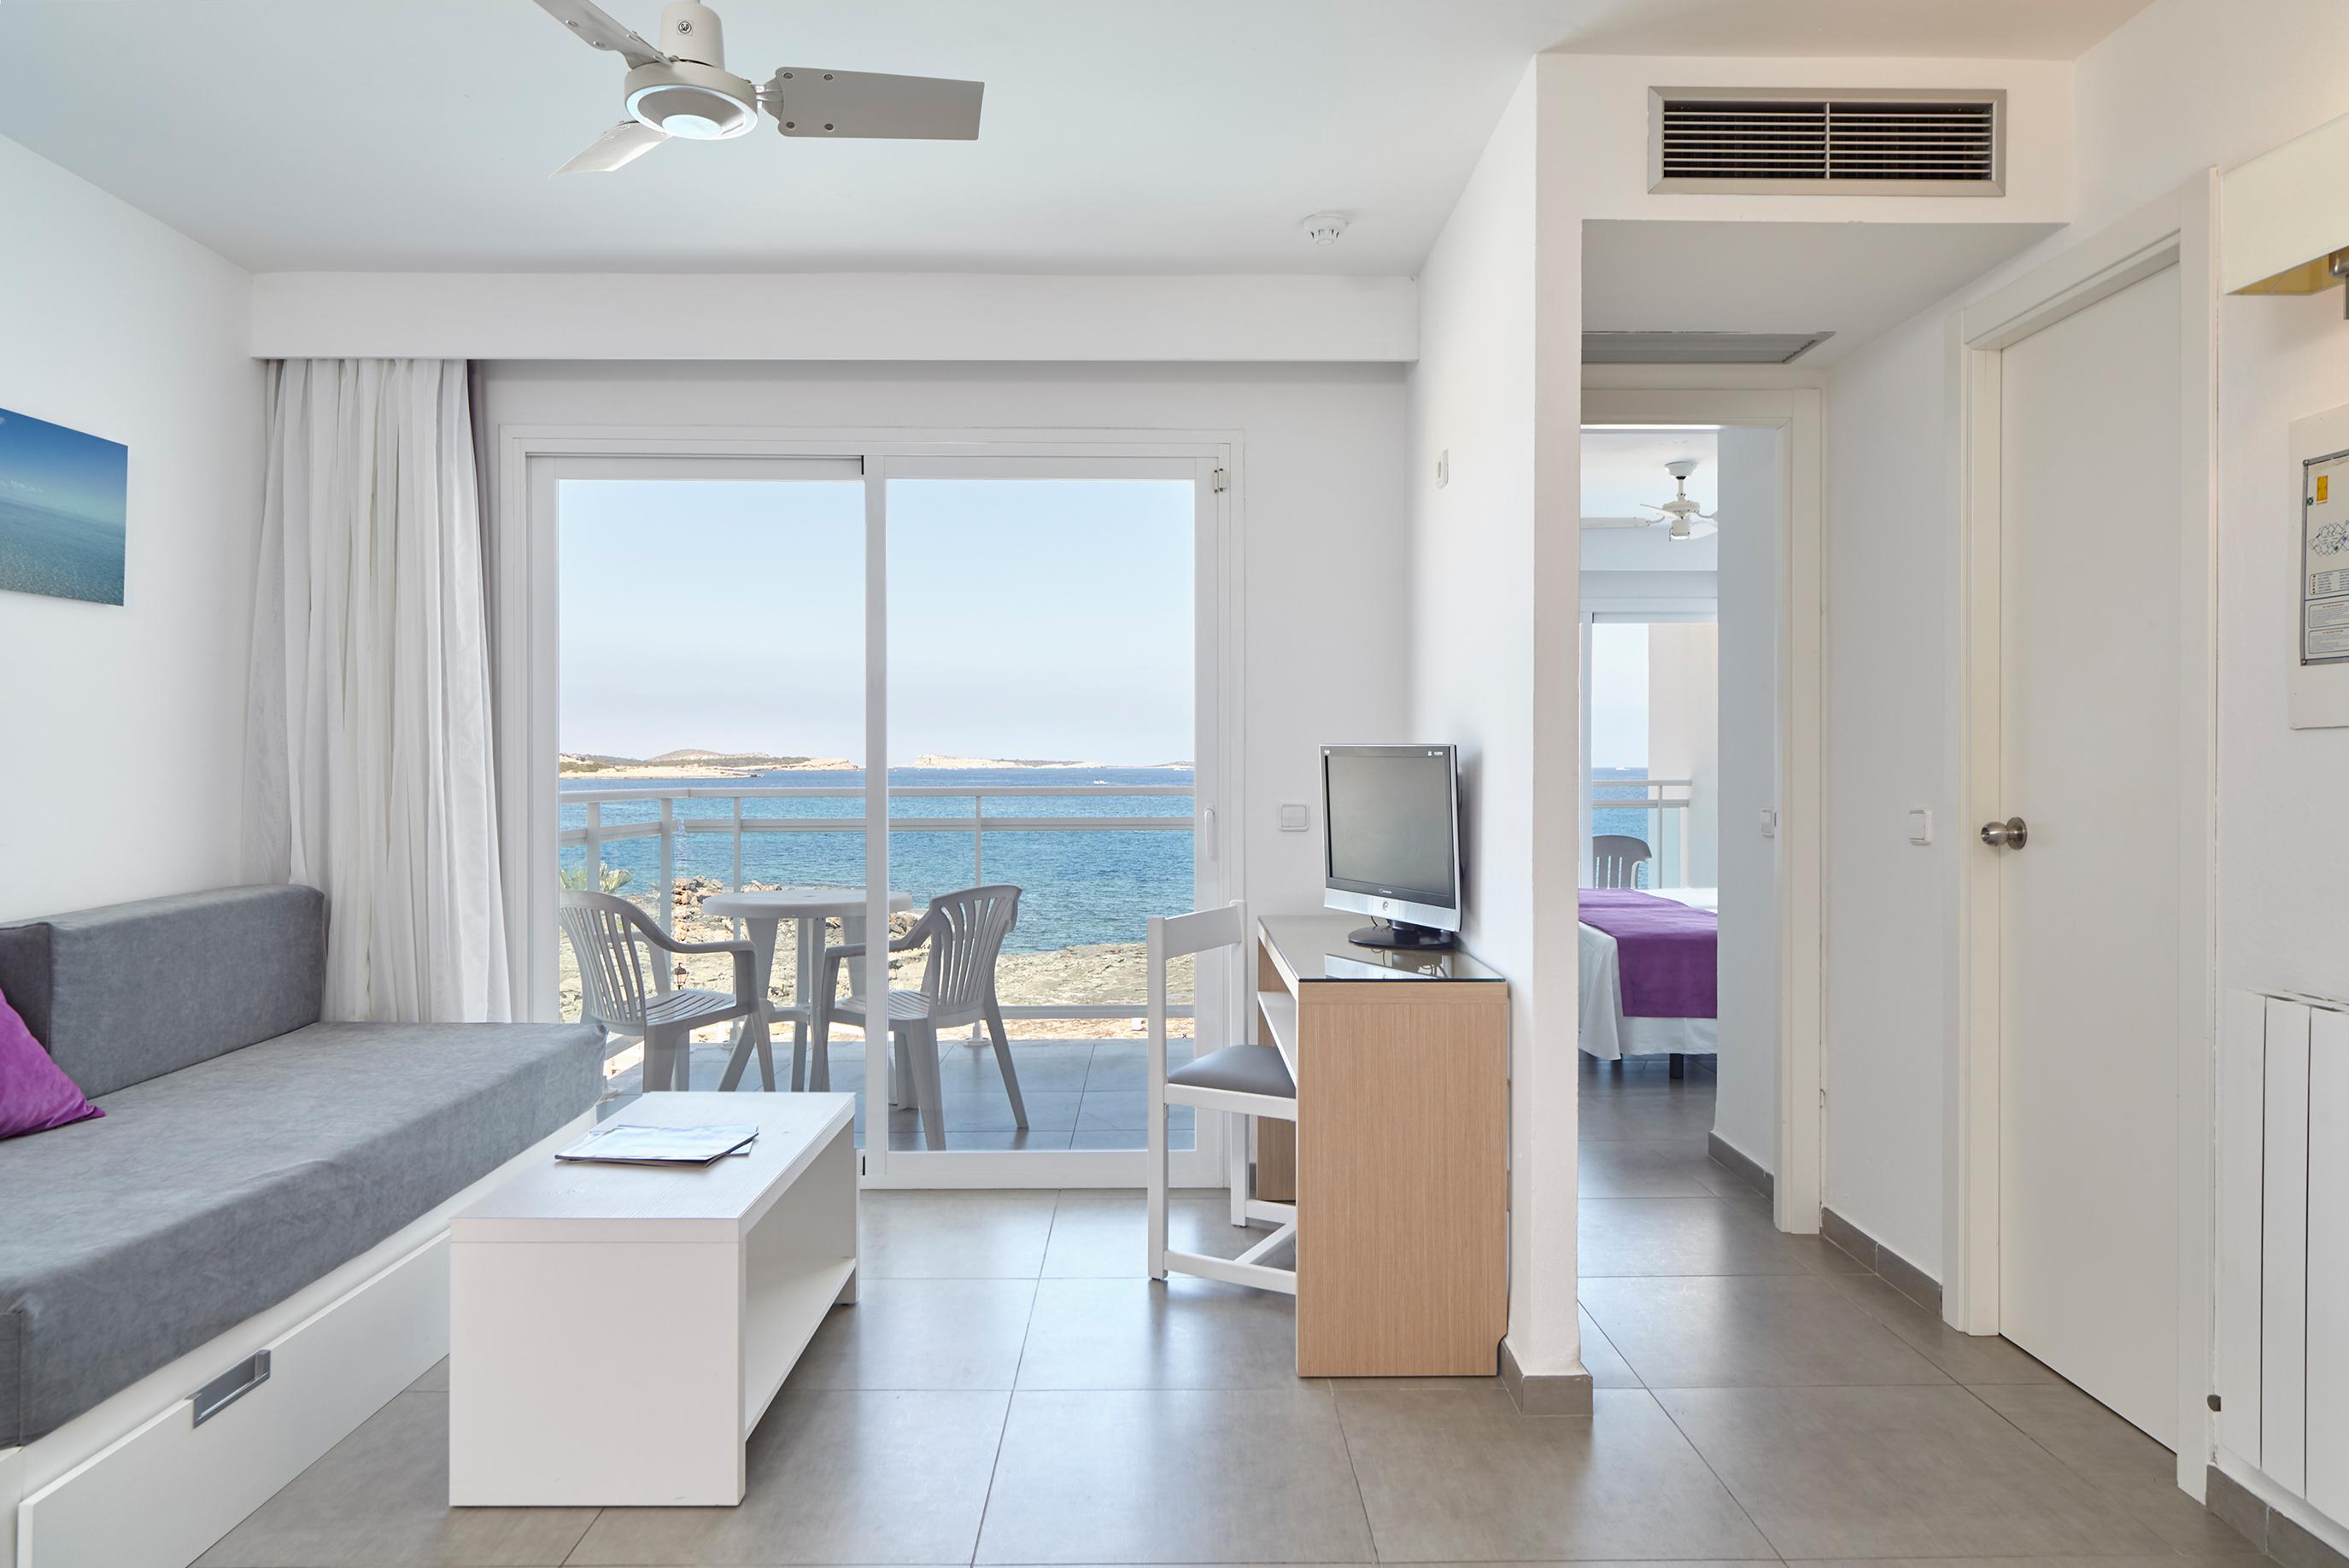 Unterkunft in der Bucht von San Antonio, IbizaFotogalerie Aparthotel / Apartments in San Antonio Bay. Aparthotel Nereida Grupo Sibiza